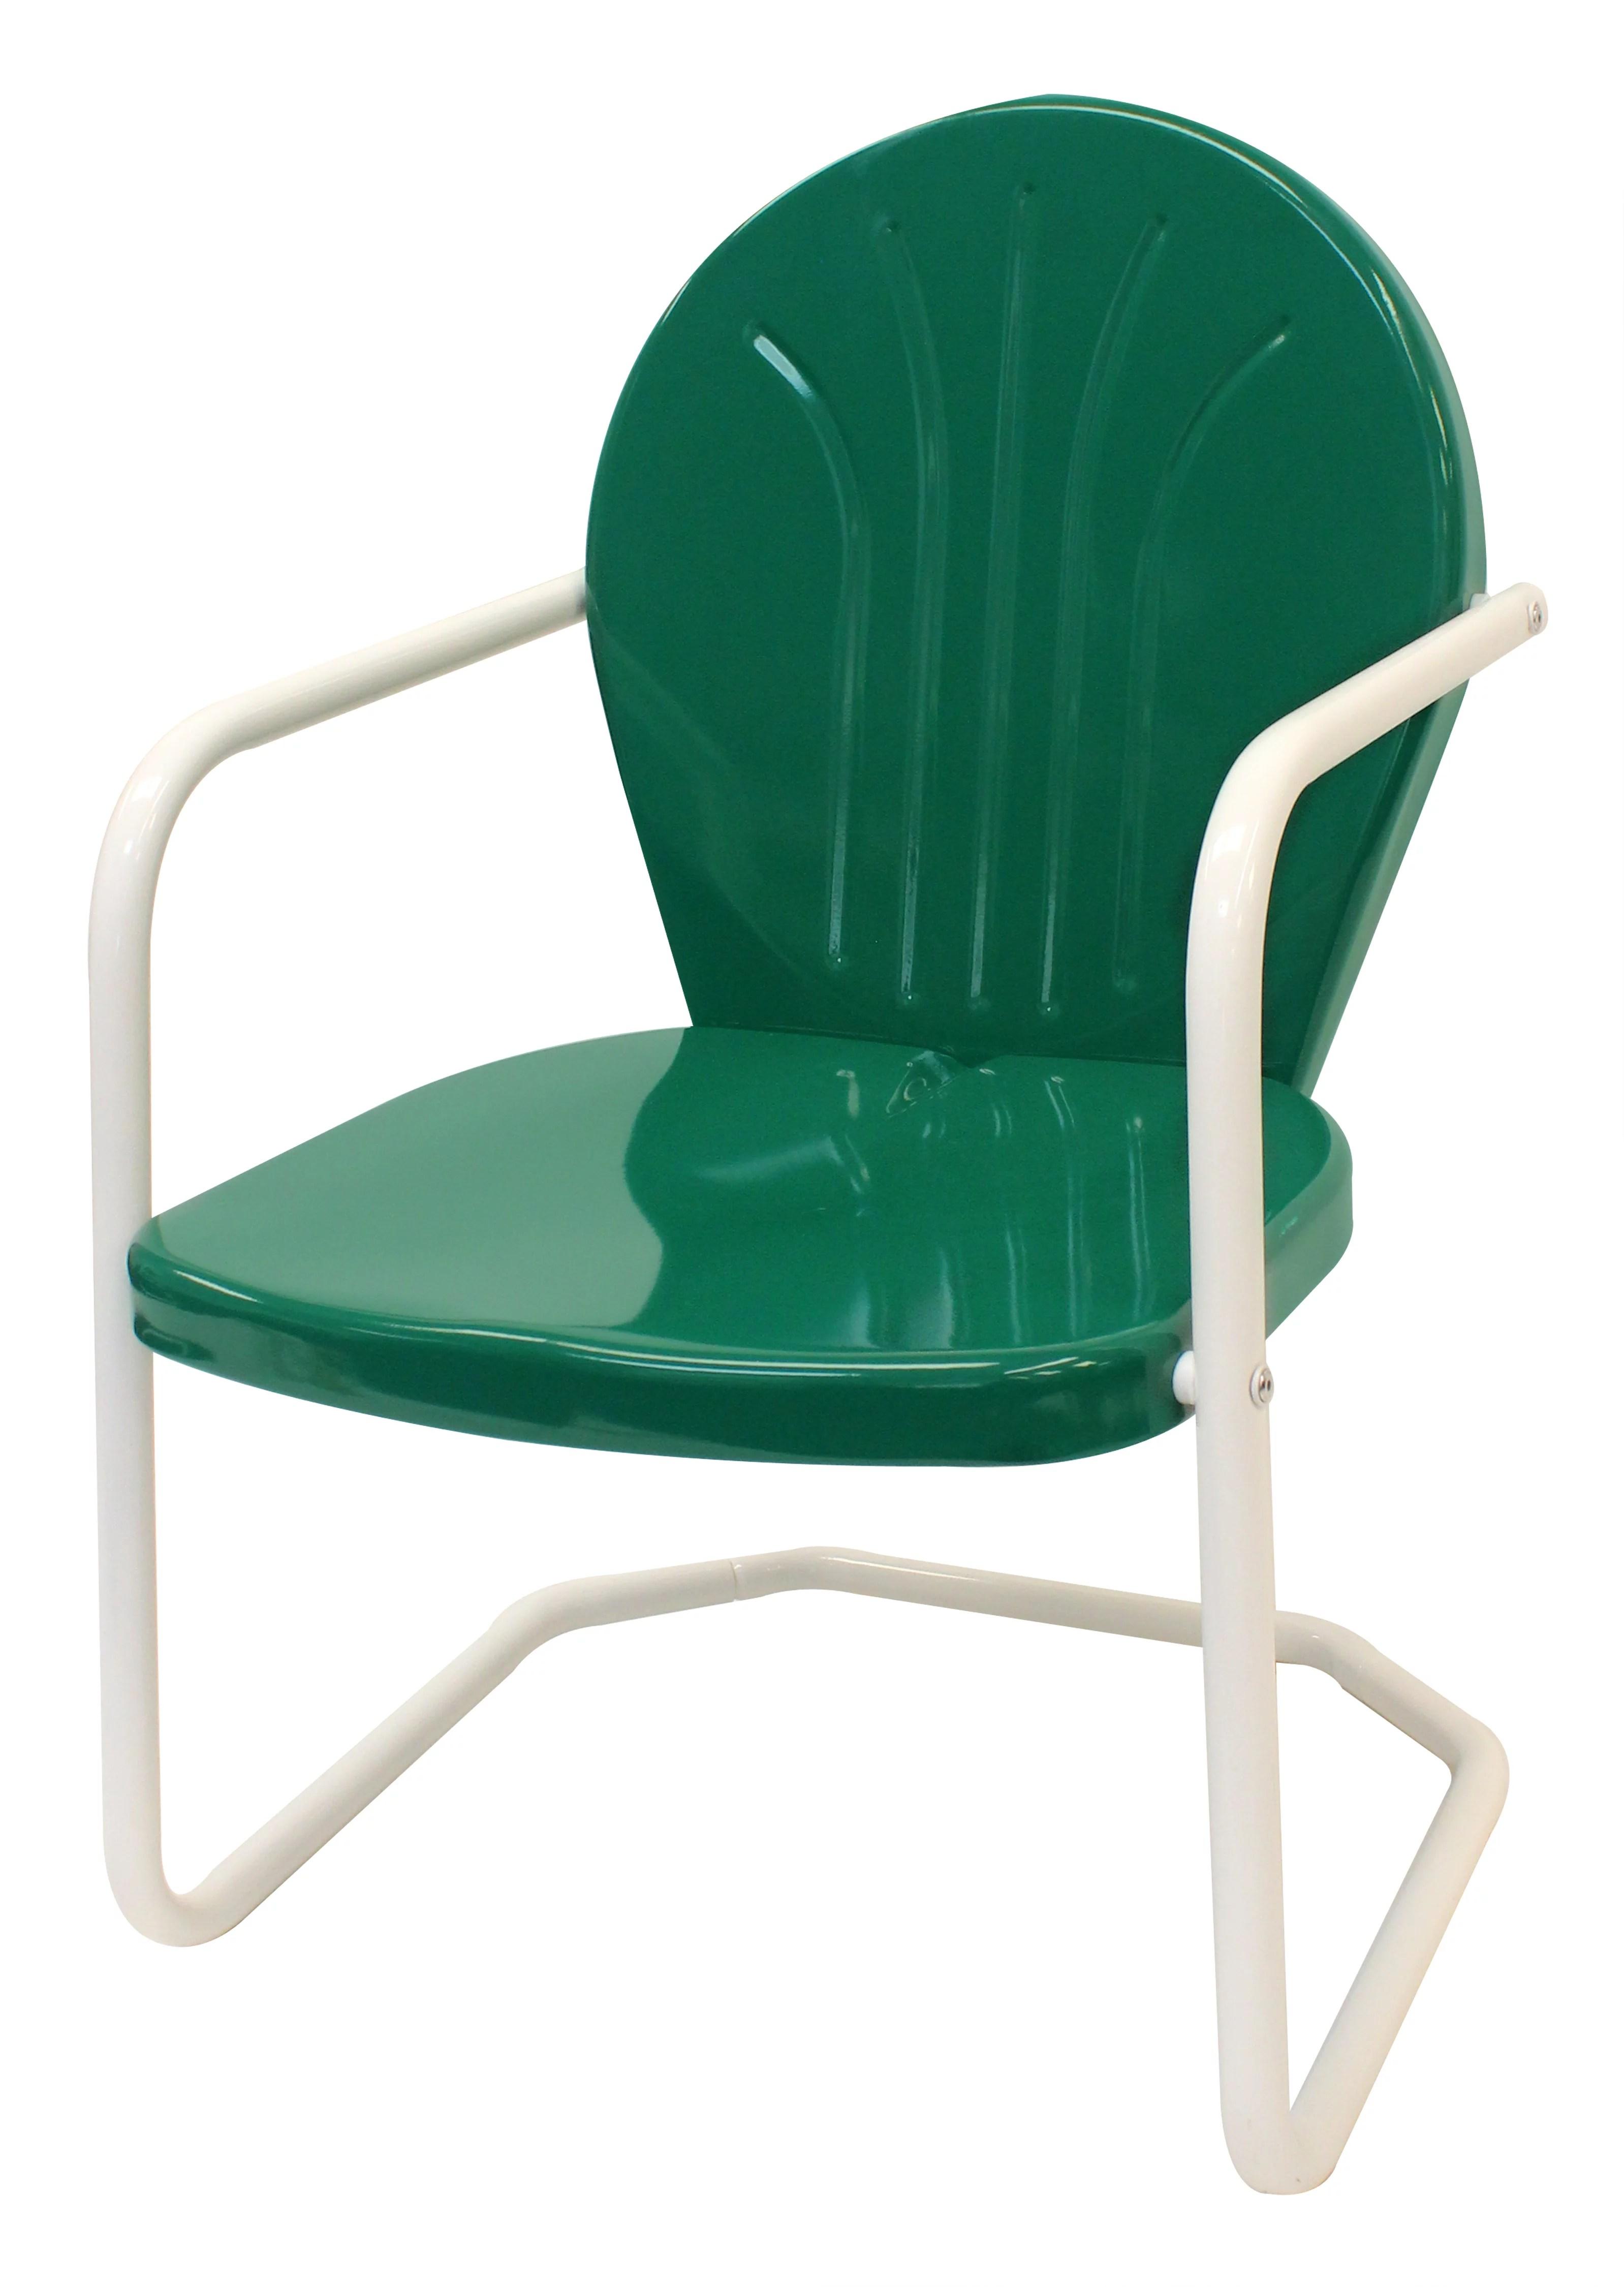 leigh country retro outdoor chair metal dark green walmart com